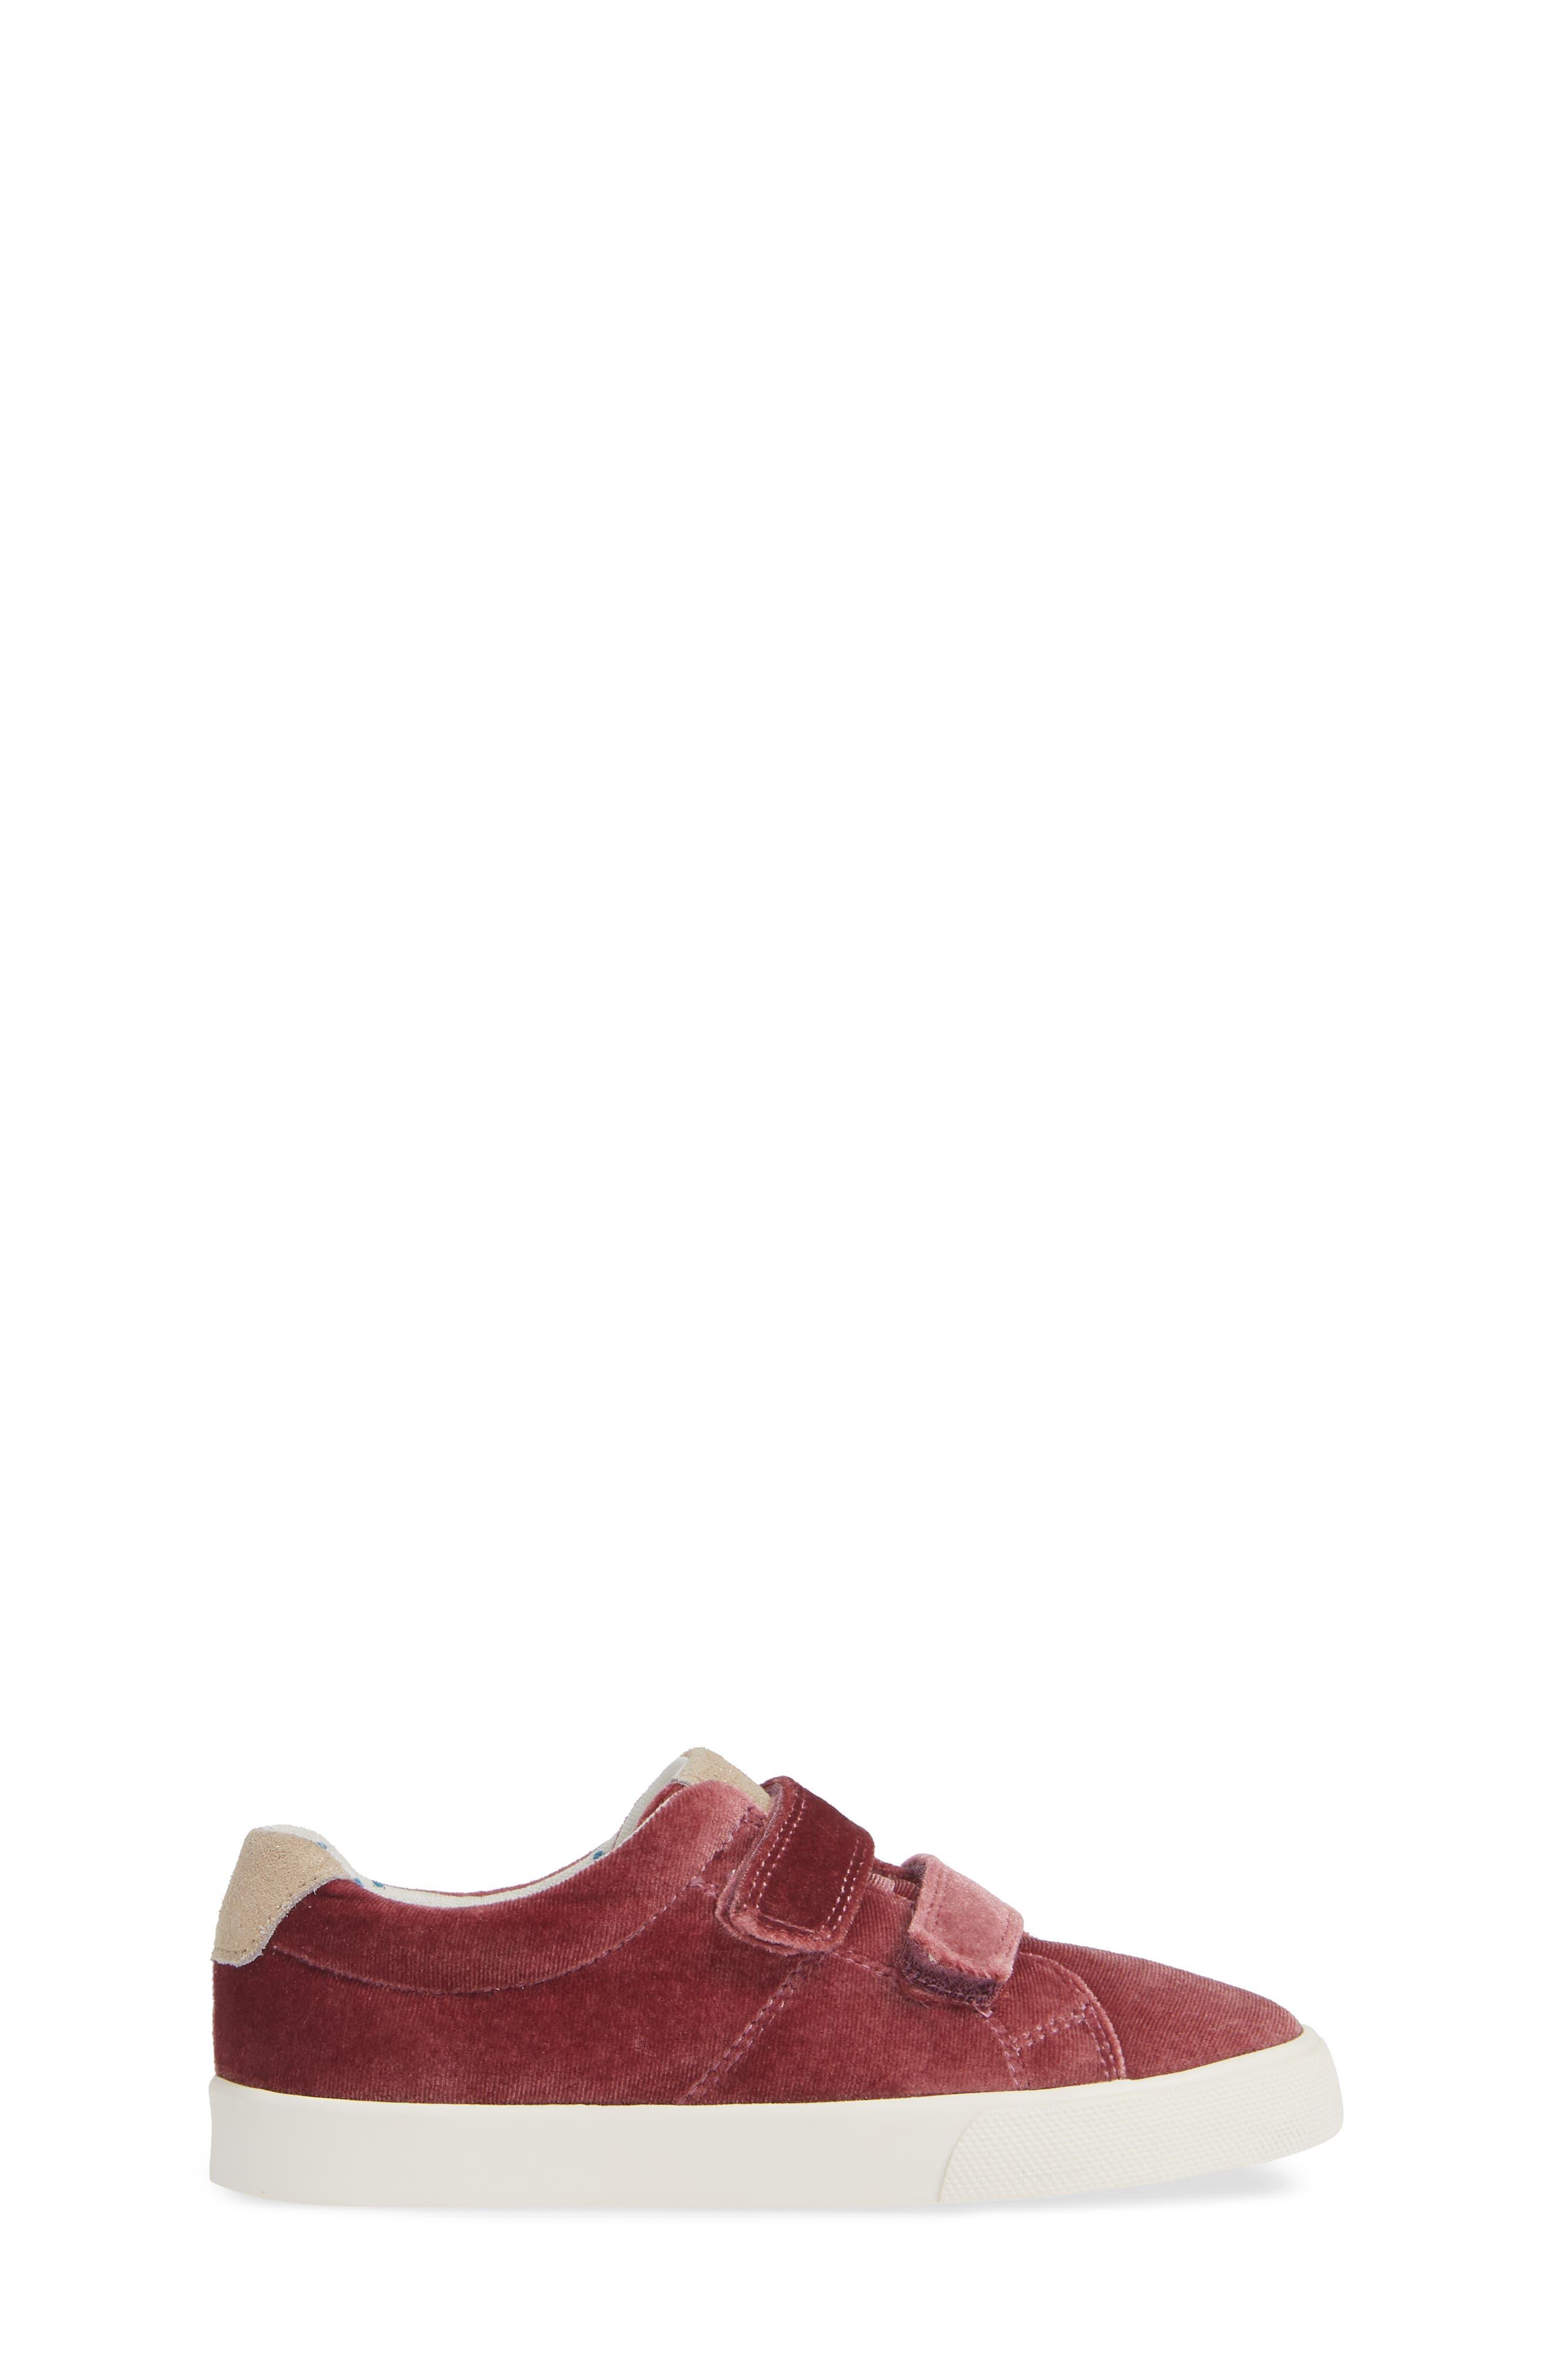 Mini Boden Fun Low Top Sneaker,                             Alternate thumbnail 6, color,                             Deep Berry